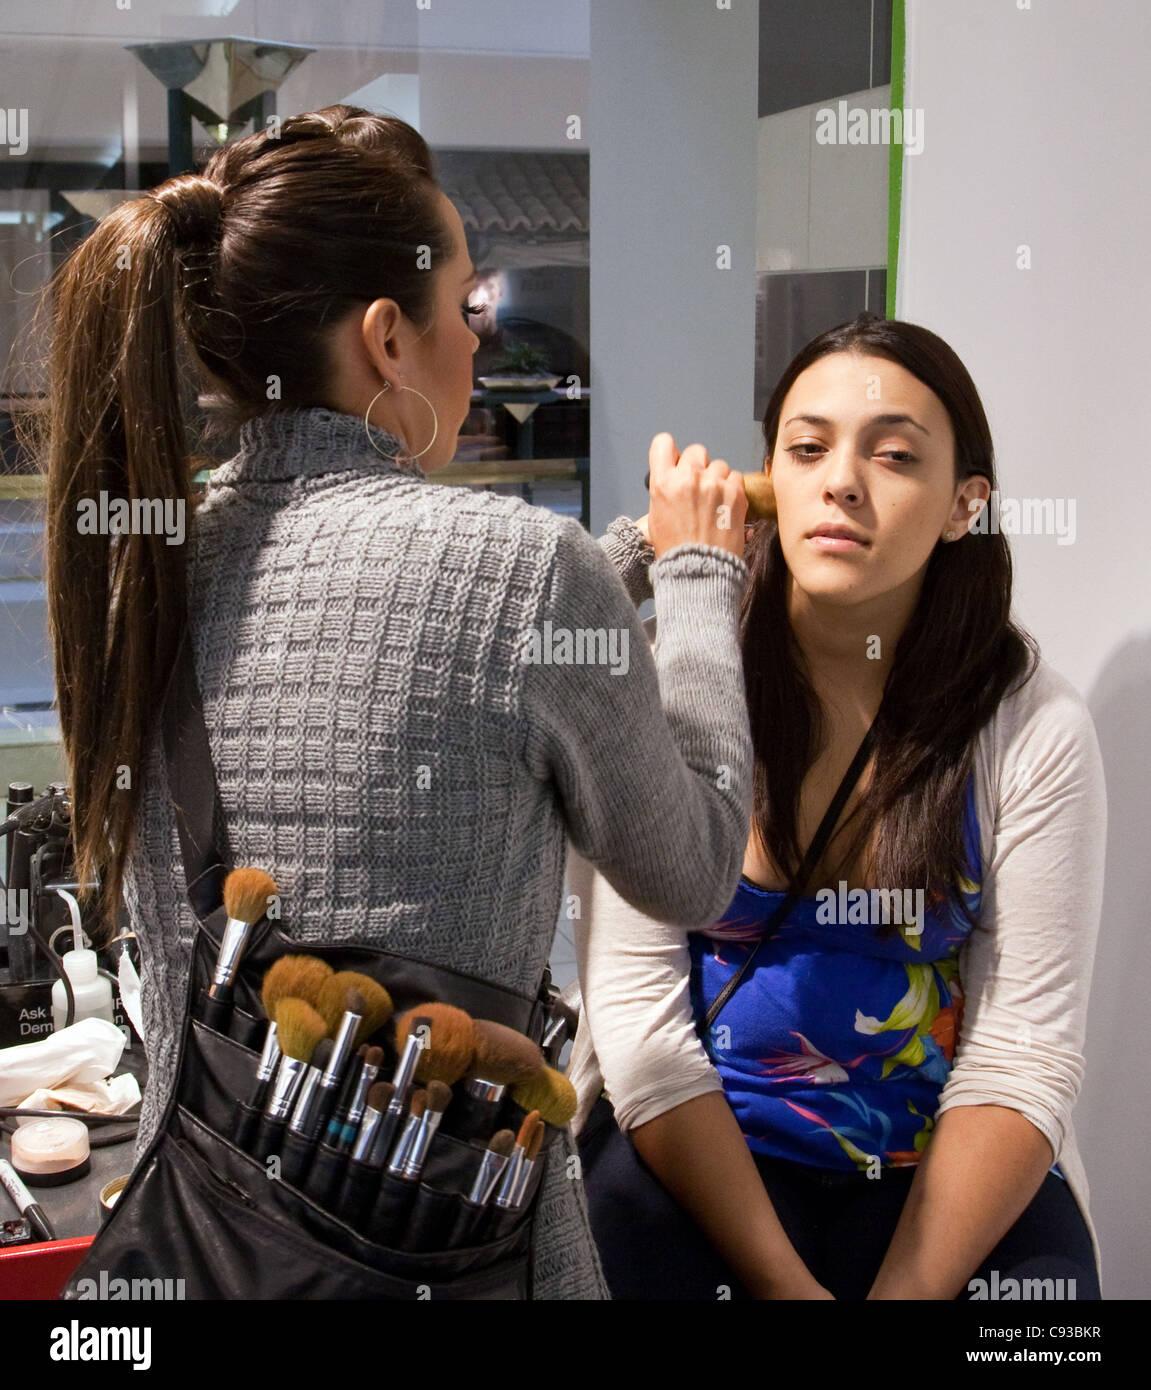 Make up artist making up a teenage girl, Montgomery Mall, Washington DC USA - Stock Image